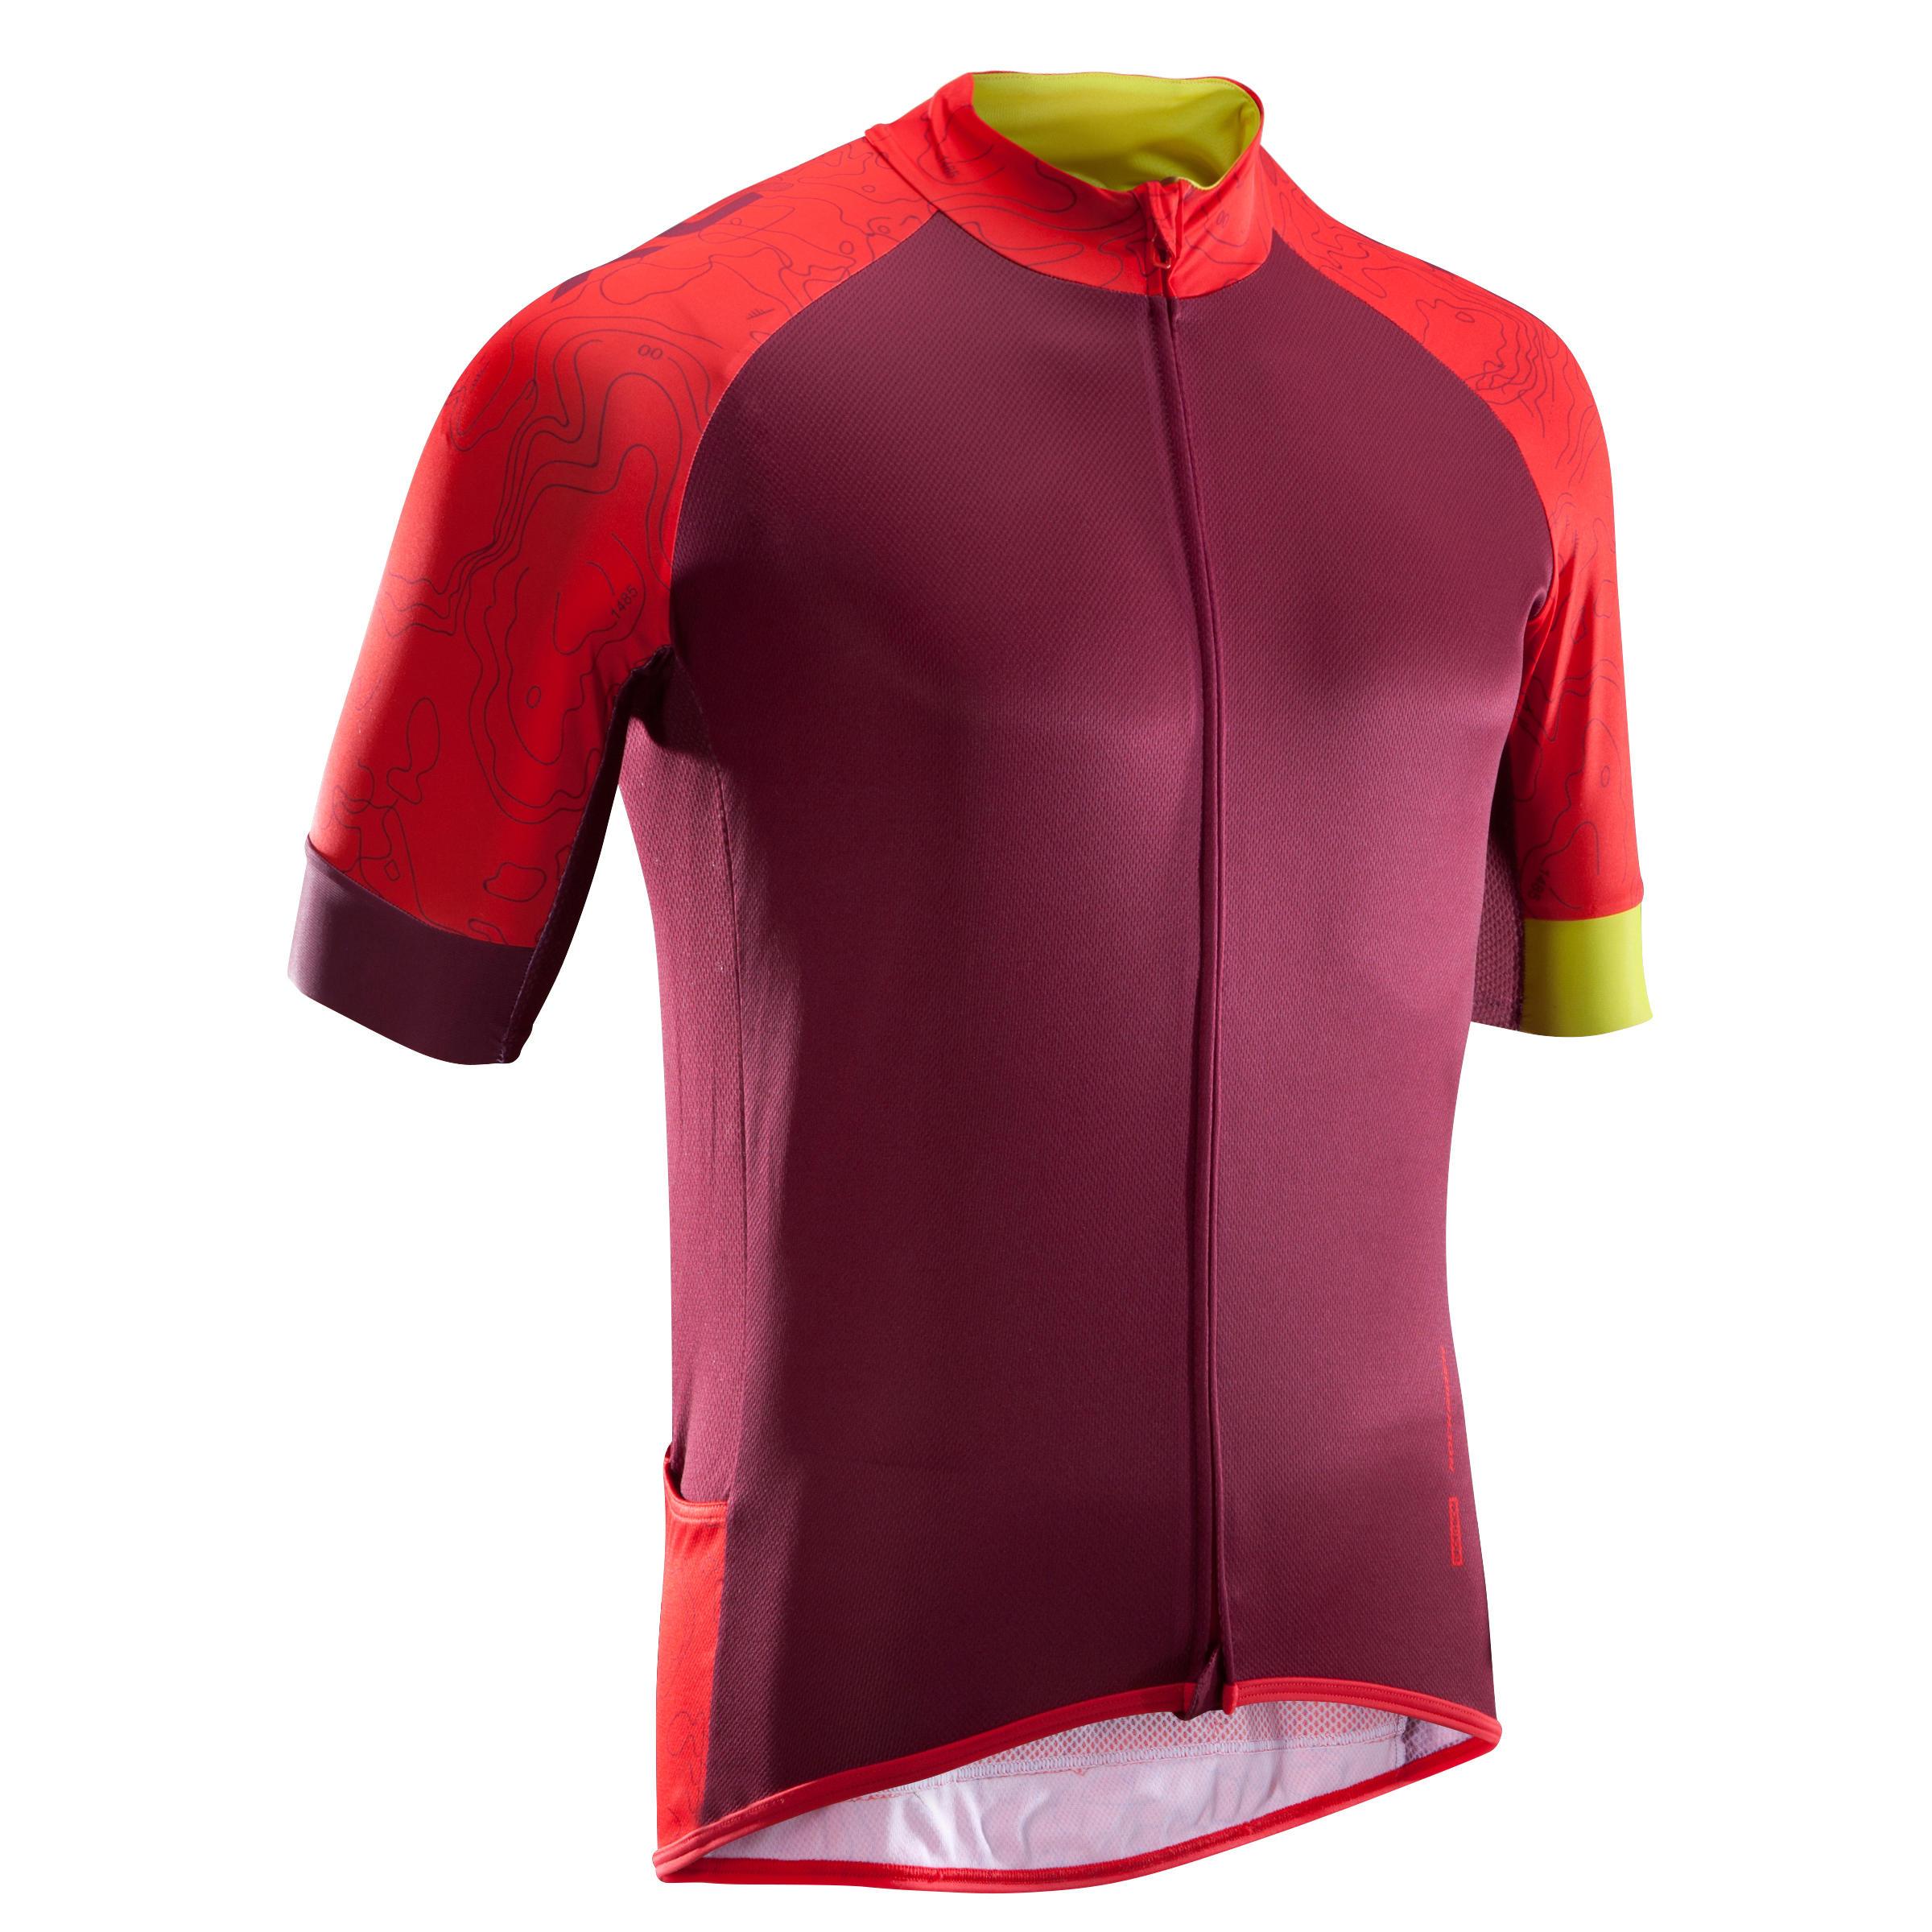 Fahrradtrikot XC 100 kurzarm MTB weinrot | Sportbekleidung > Trikots > Fahrradtrikots | Rot - Gelb | Rockrider